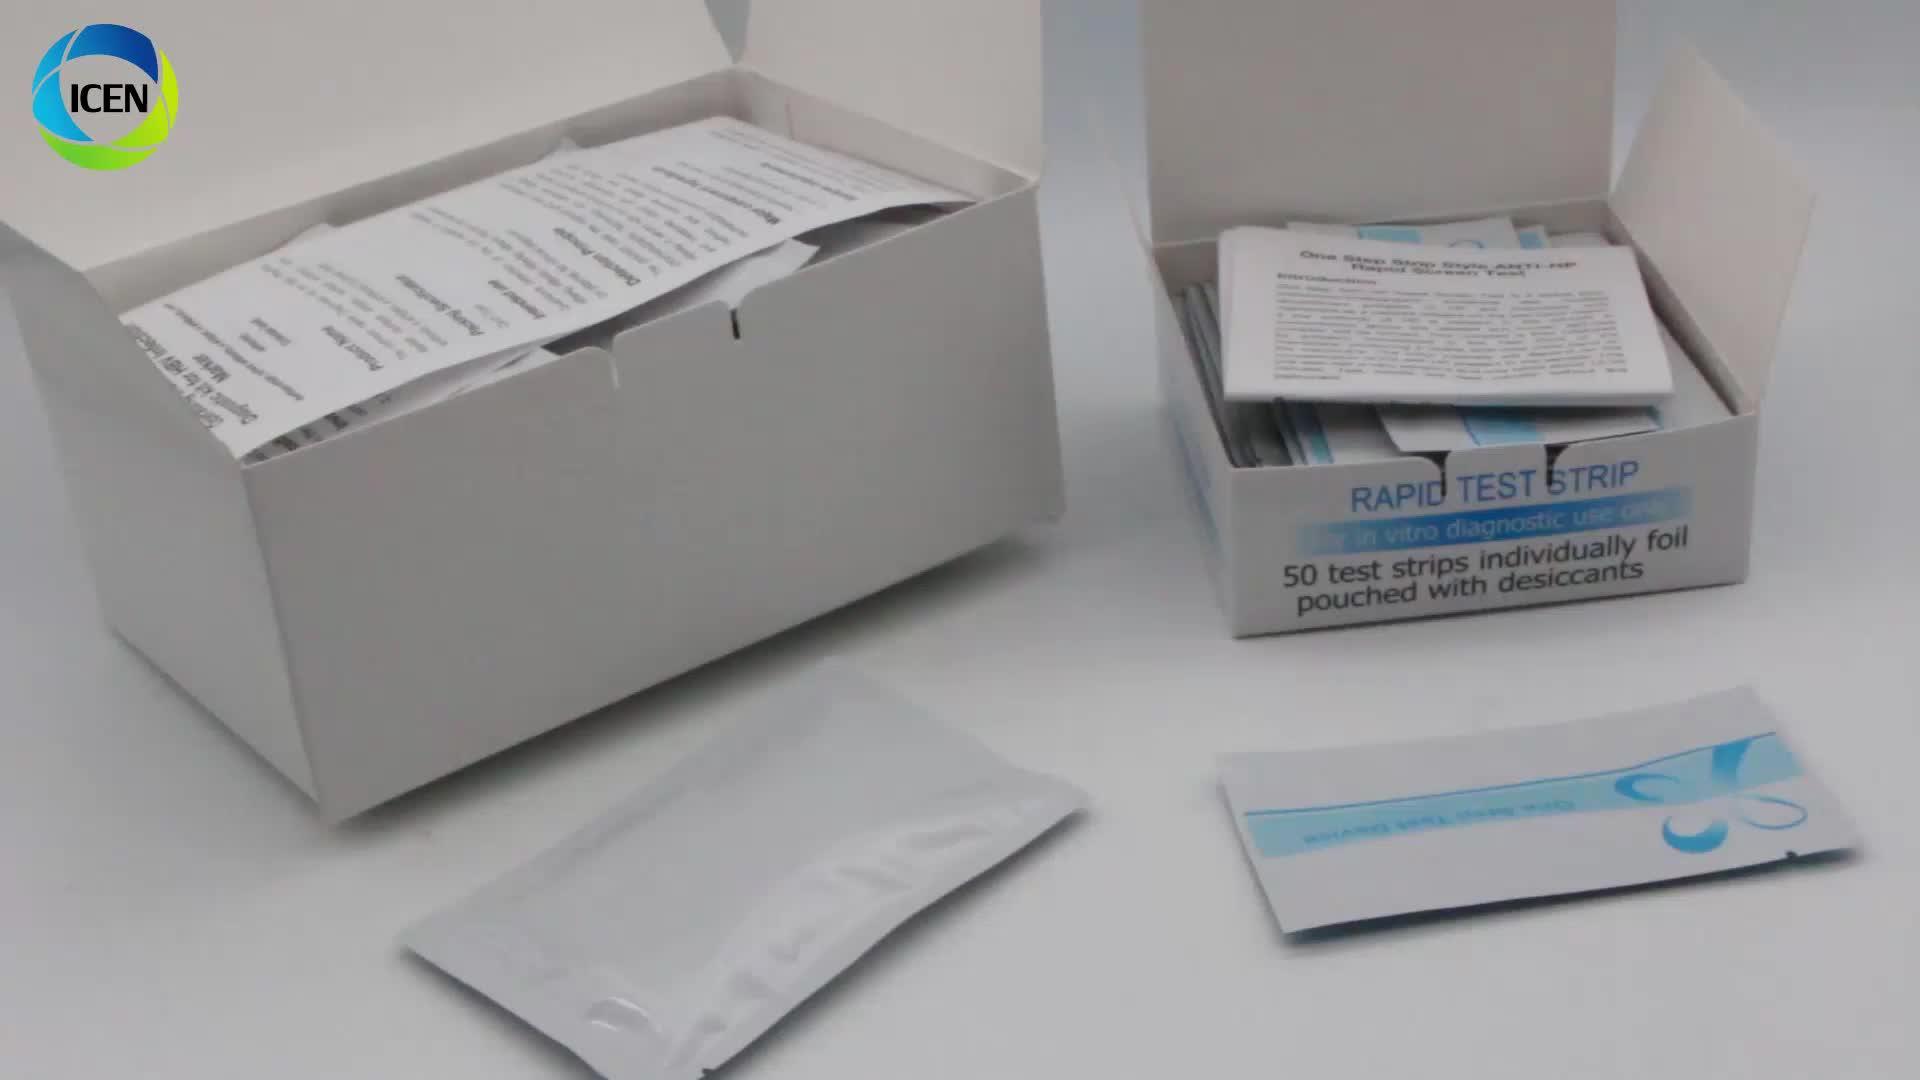 High Specificity Safe HIV Diagnostic Kits One Step HIV Test Device Aids Test Kit